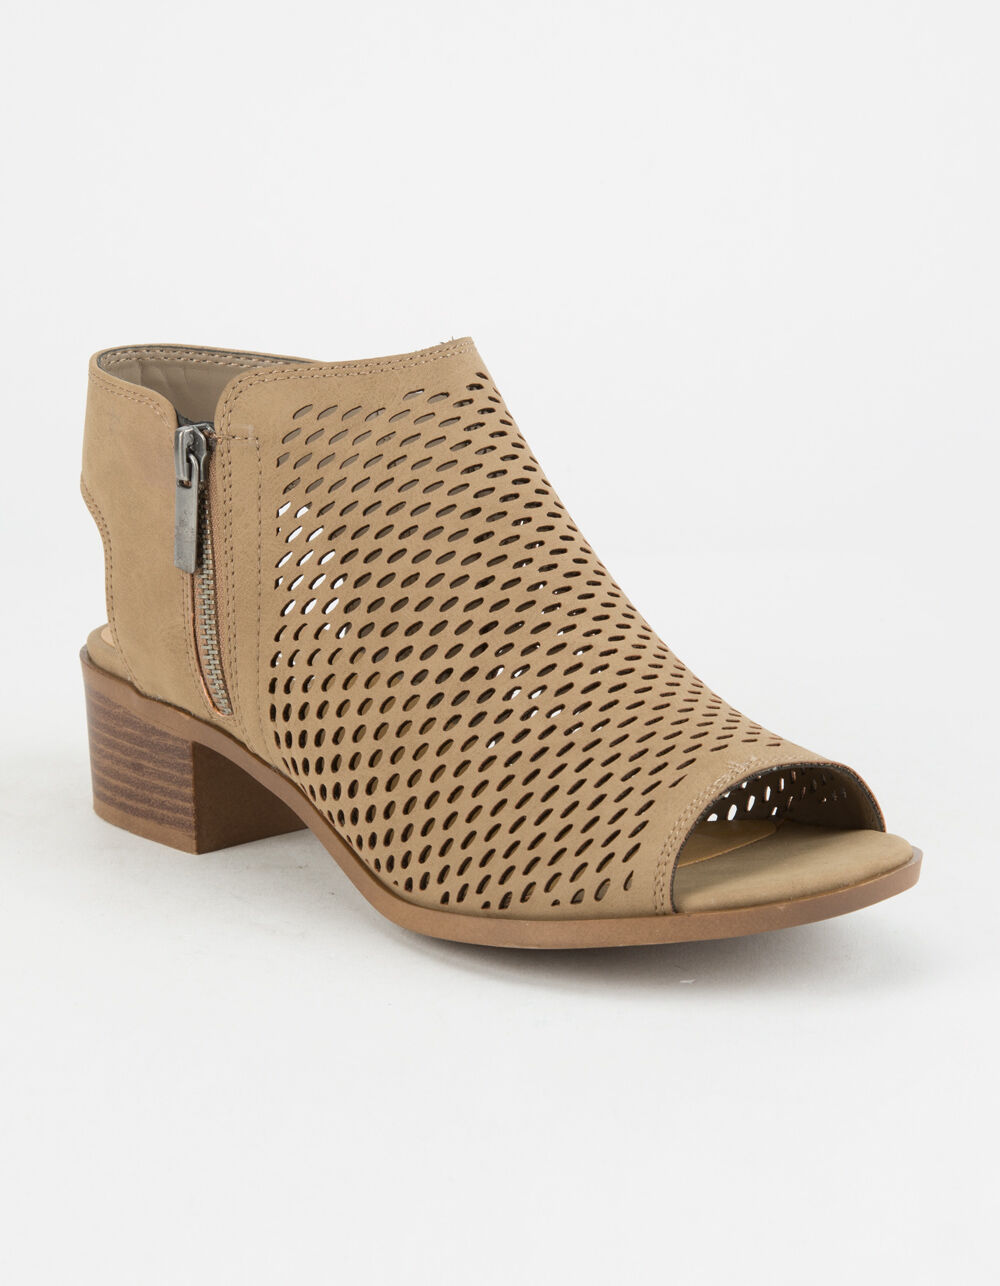 SODA Perforated Block Heel Taupe Booties